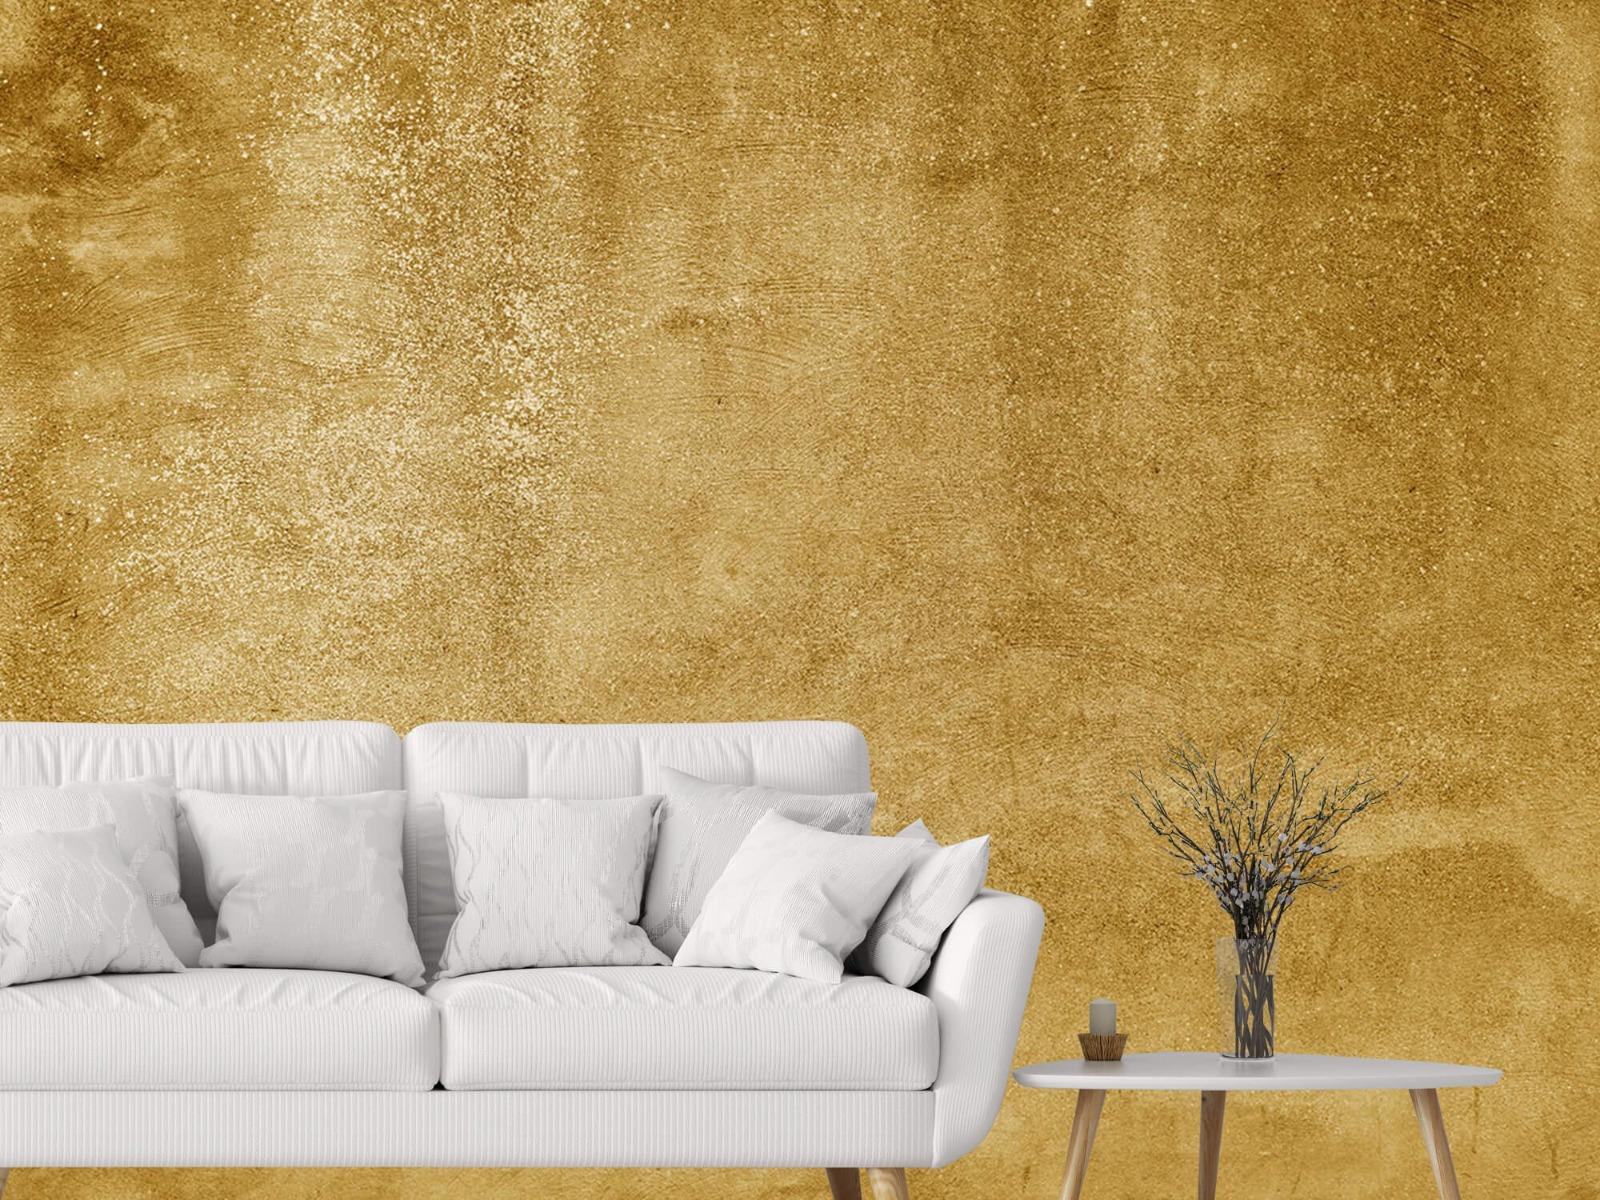 Betonlook behang - Oker geel beton - Woonkamer 4